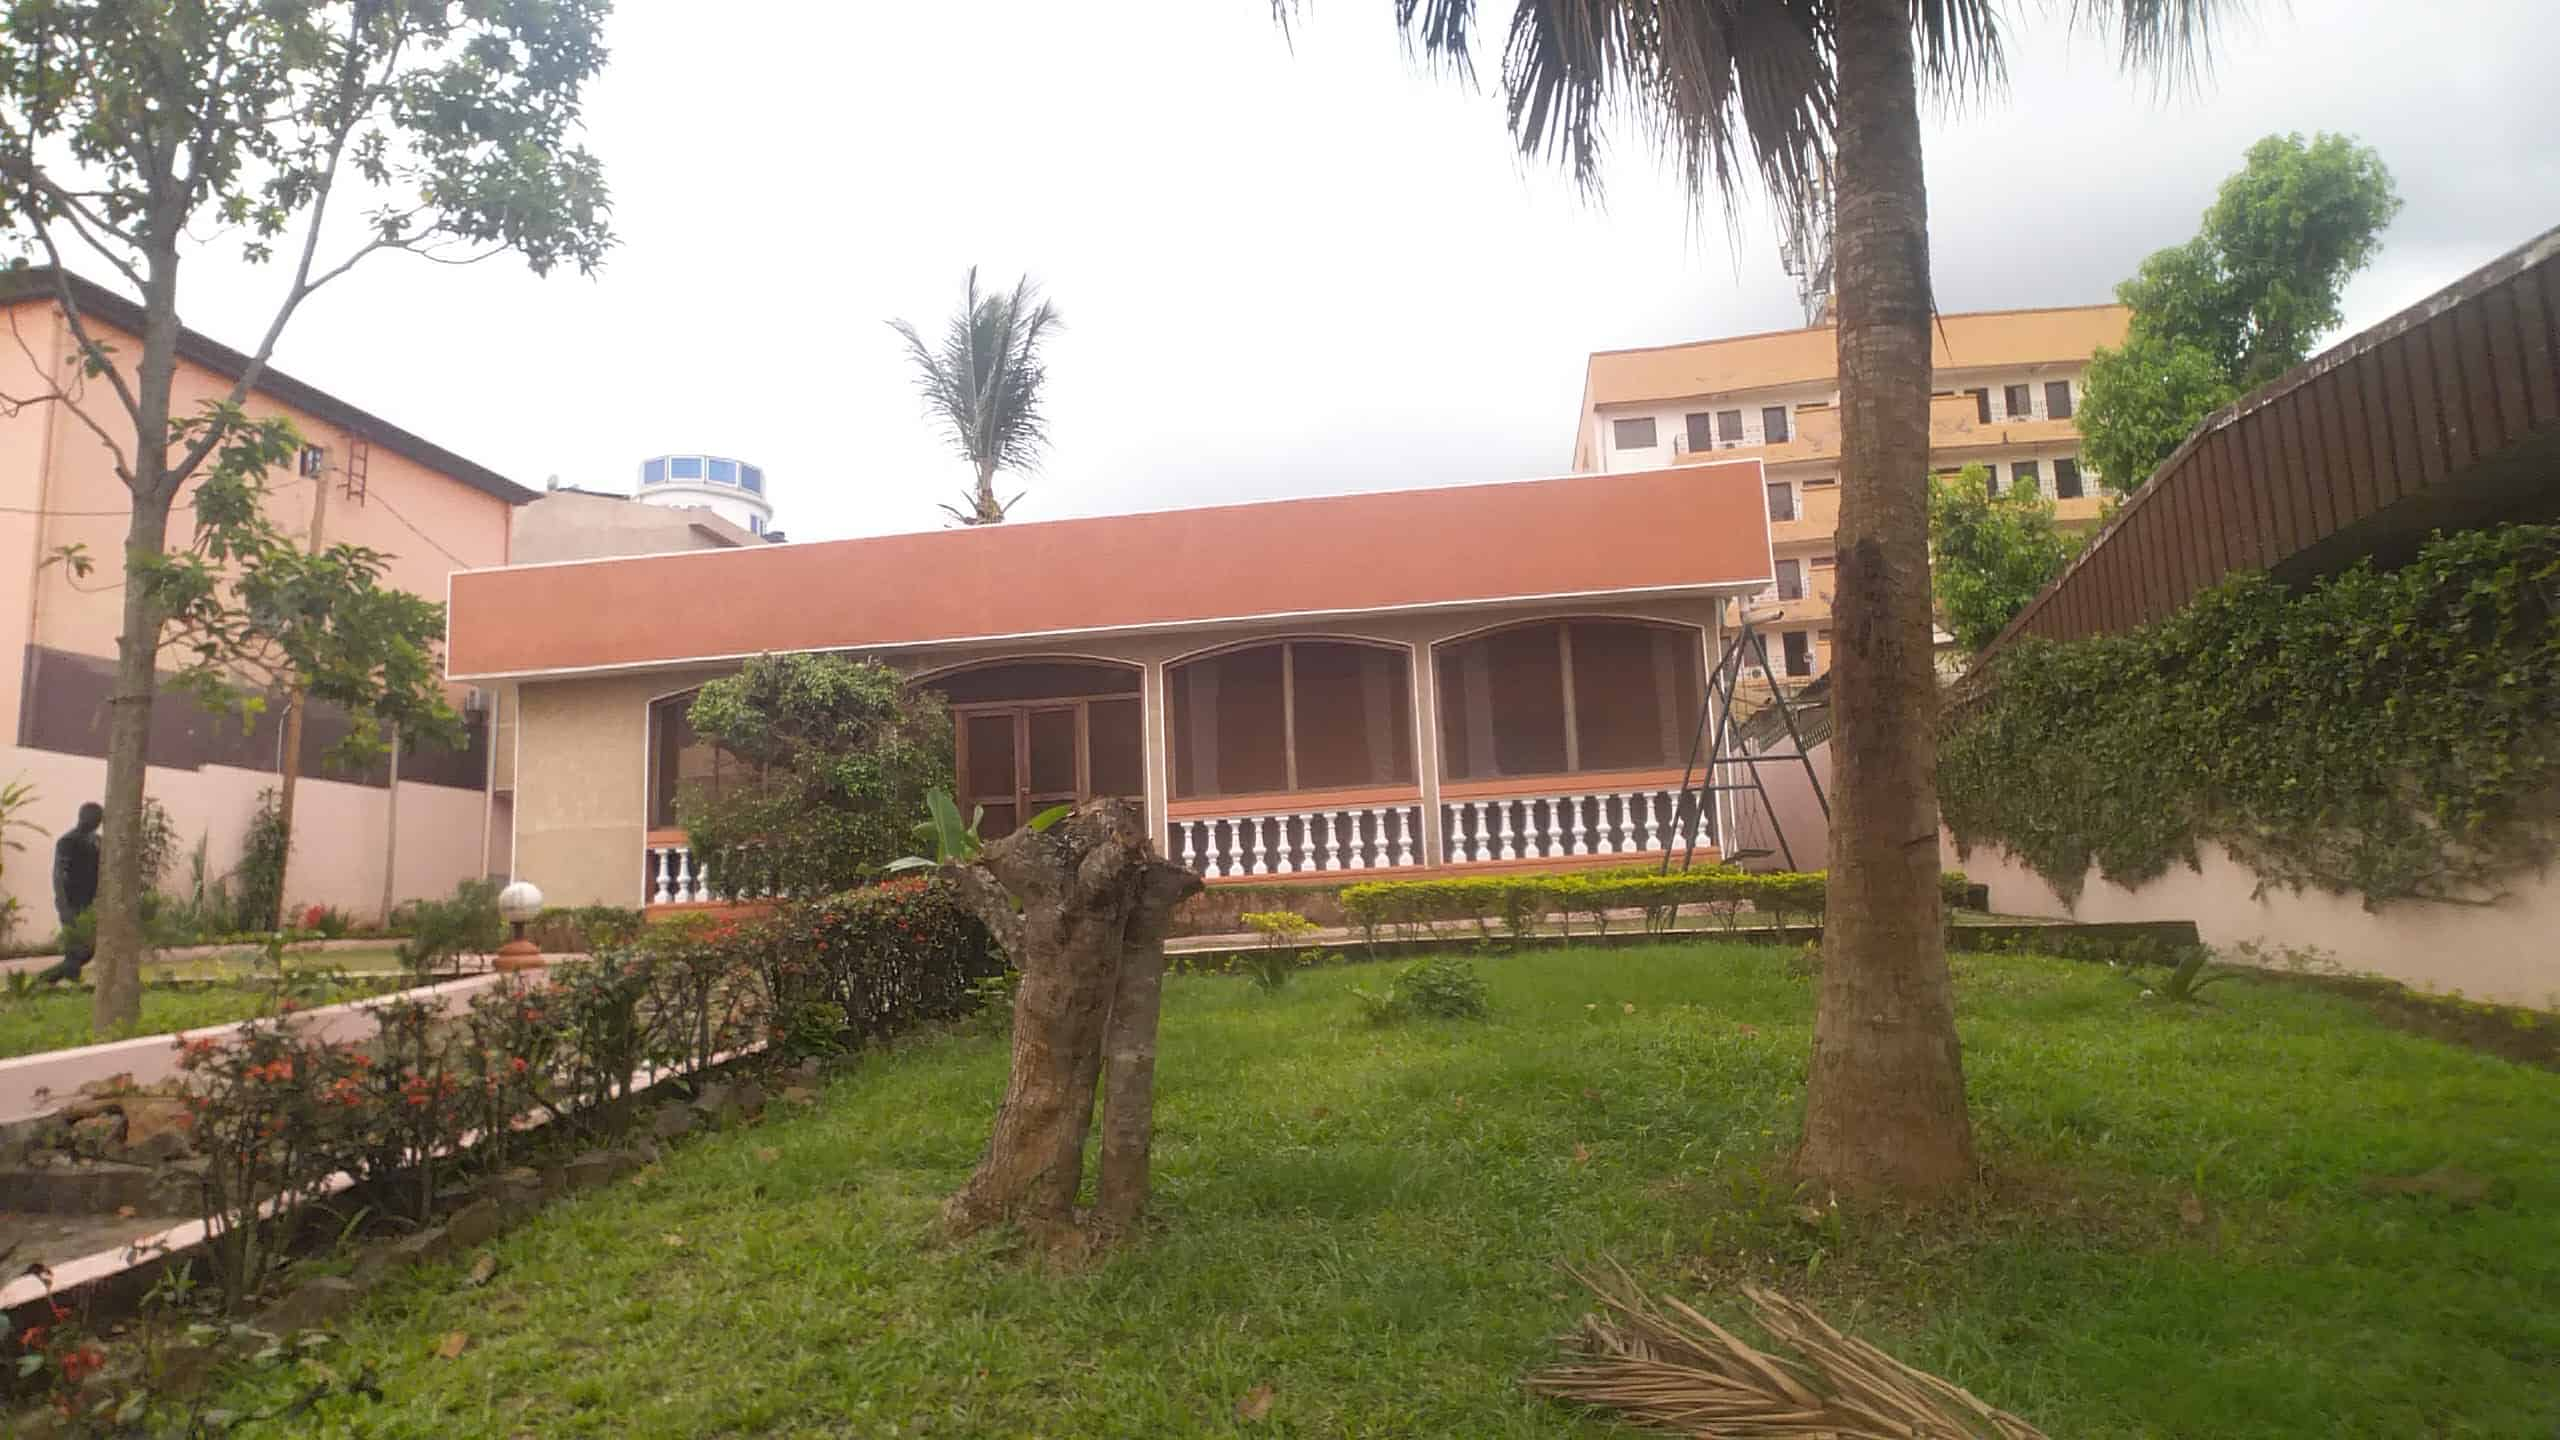 House (Villa) to rent - Yaoundé, Mfandena, Omnisport - 2 living room(s), 4 bedroom(s), 4 bathroom(s) - 900 000 FCFA / month